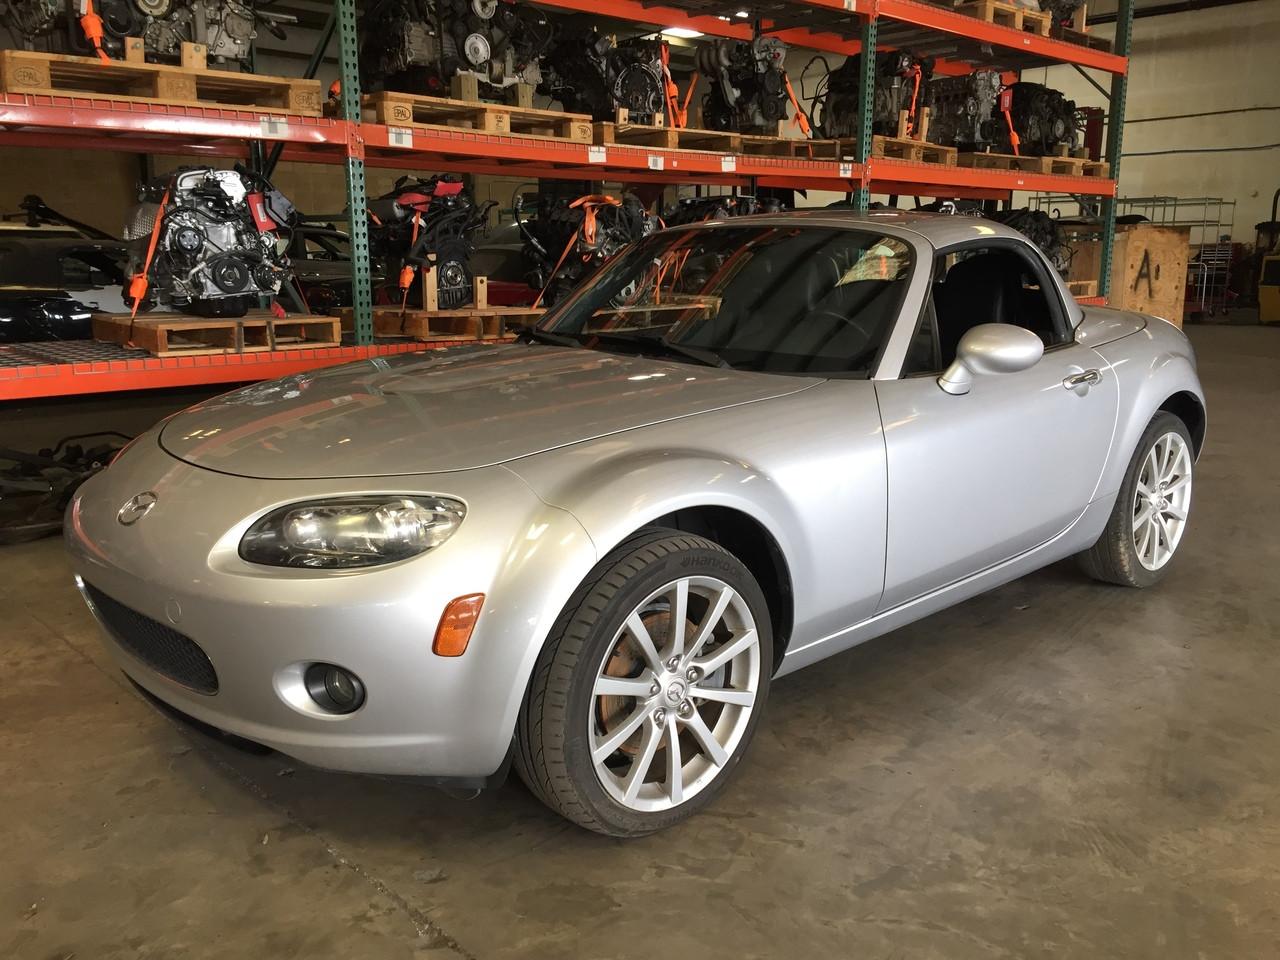 NC] 2007 Mazda MX5 Miata GT PRHT Part Out | 82k | Redline